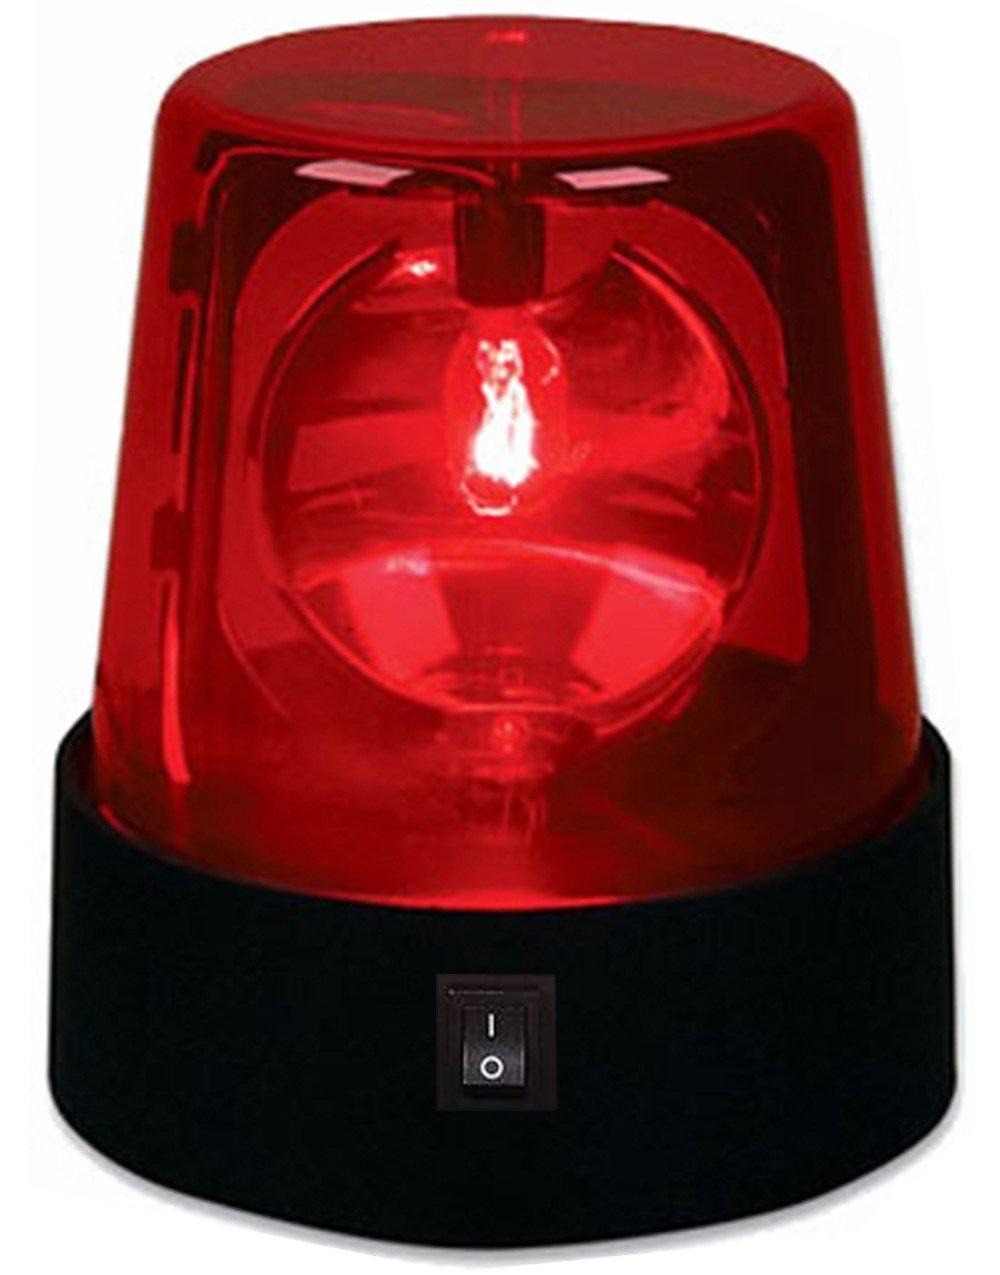 red light colourbox photo flashing stock image